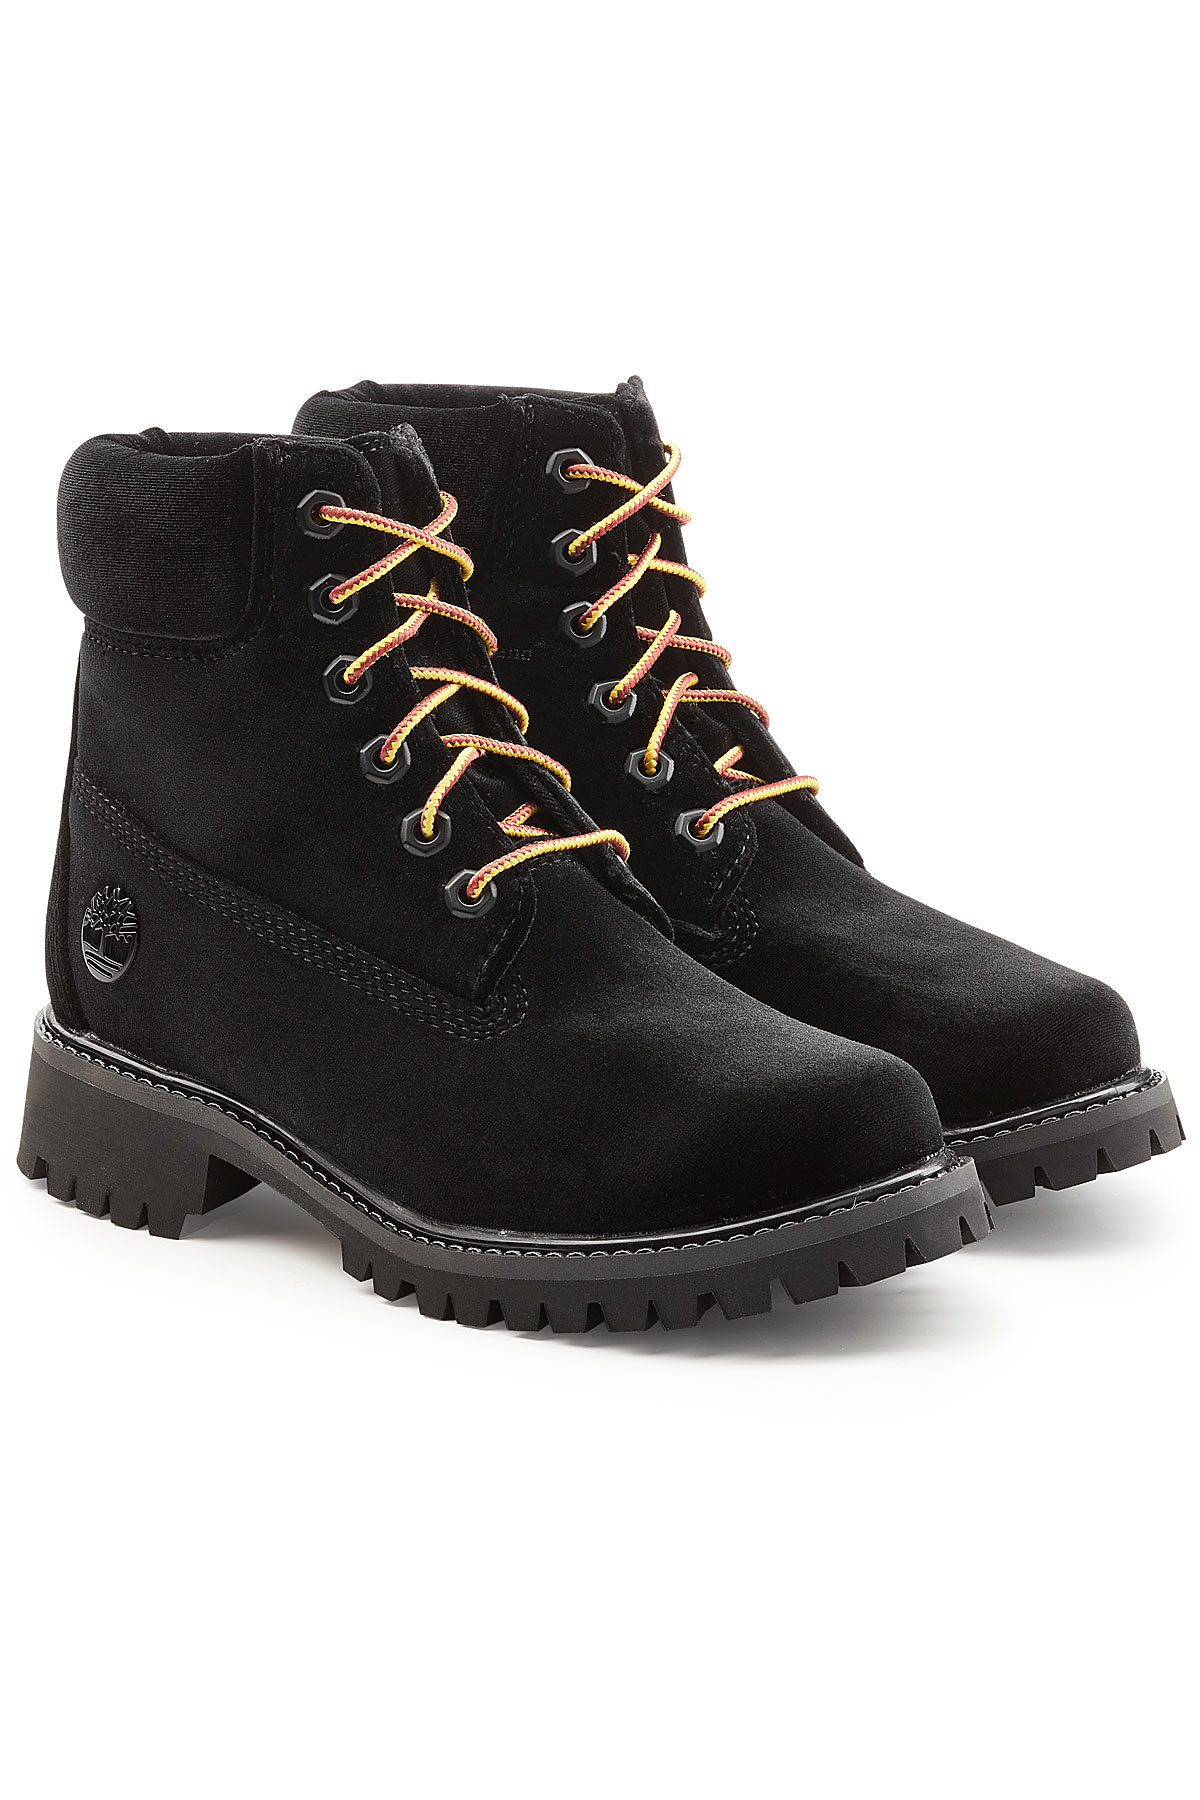 OFF-WHITEX Timberland Velvet Ankle Boots Gr. EU 42 FOaWrYko6